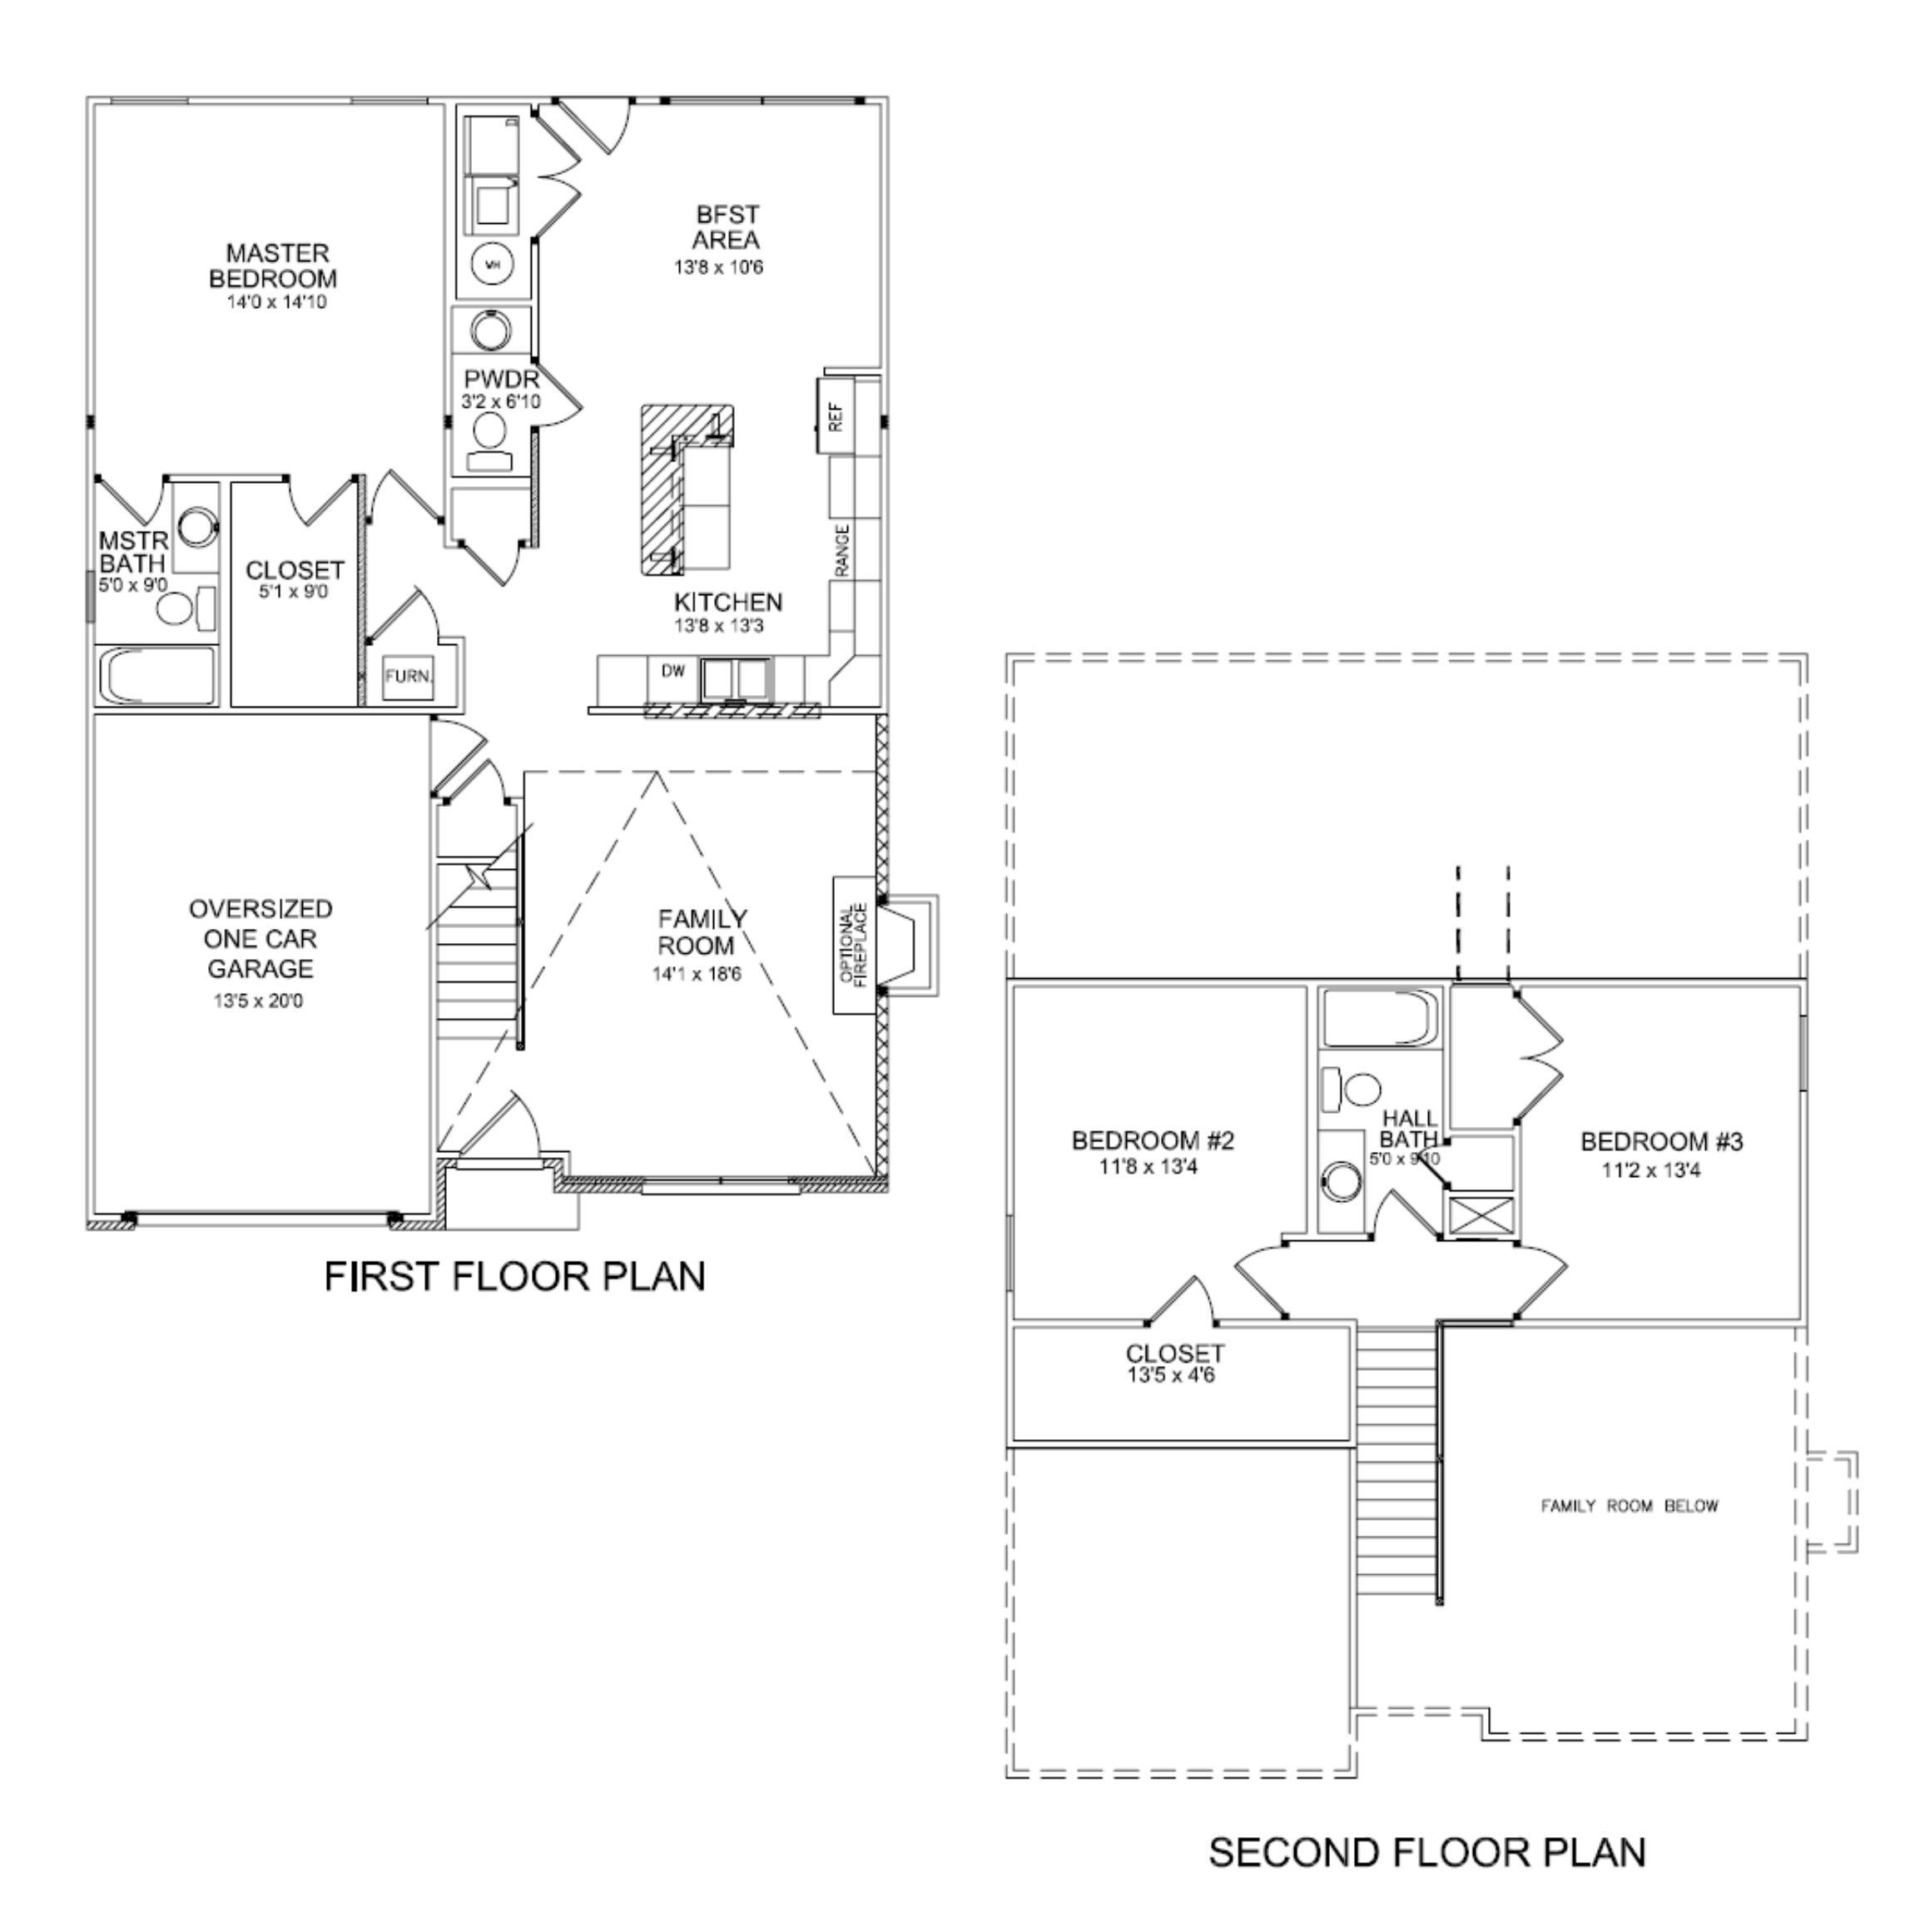 Plan louisville ky centex home builders the on floor plans louisville